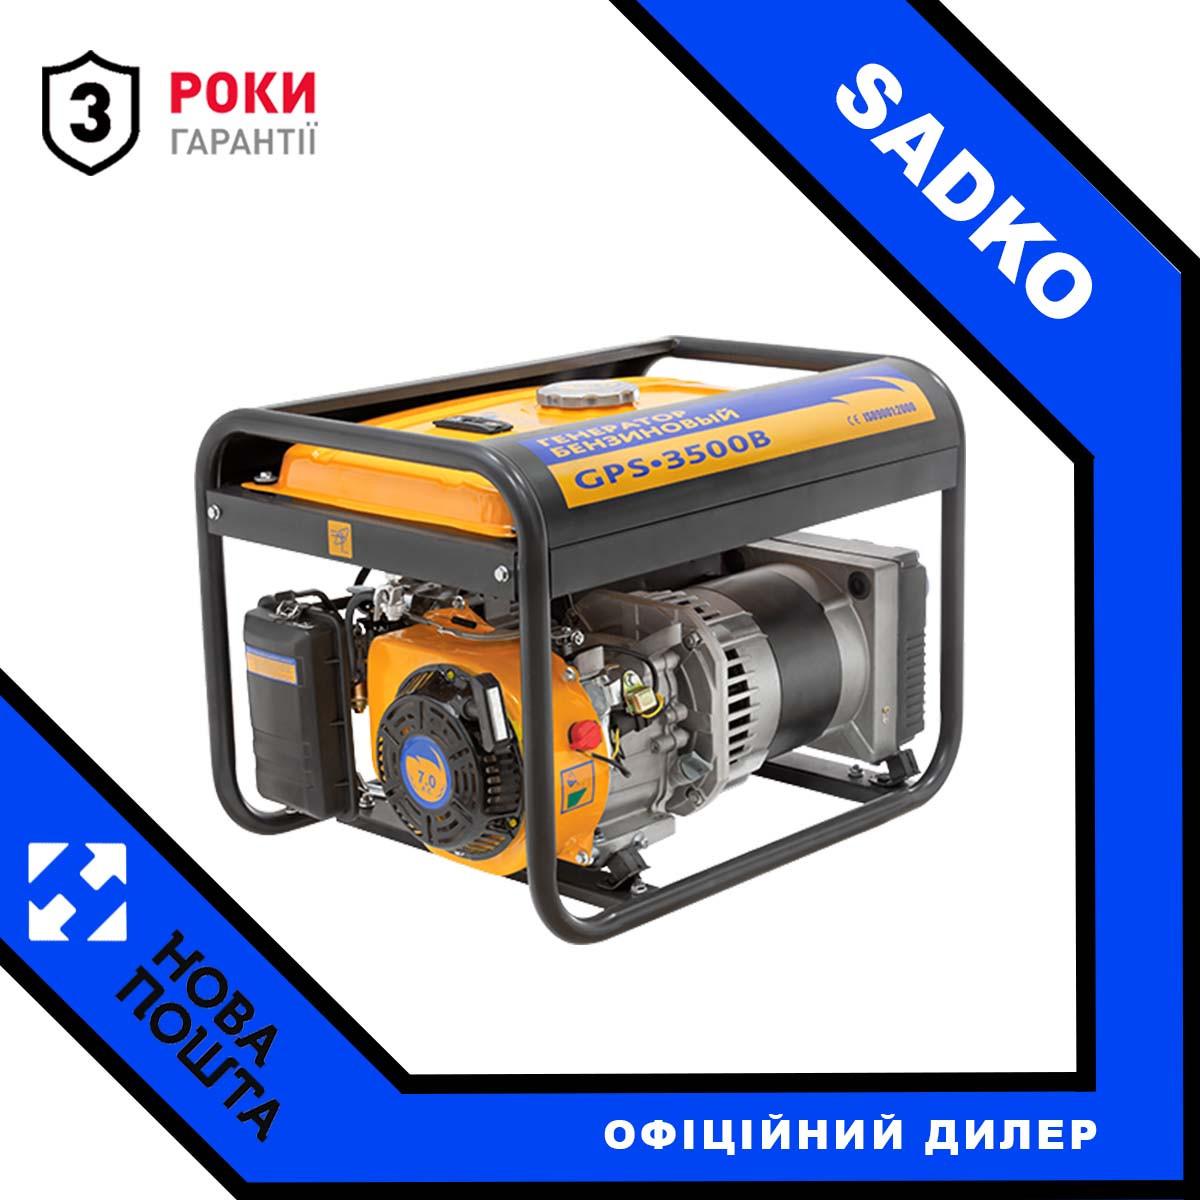 Бензогенератор Sadko GPS-3500B 2,8 кВт